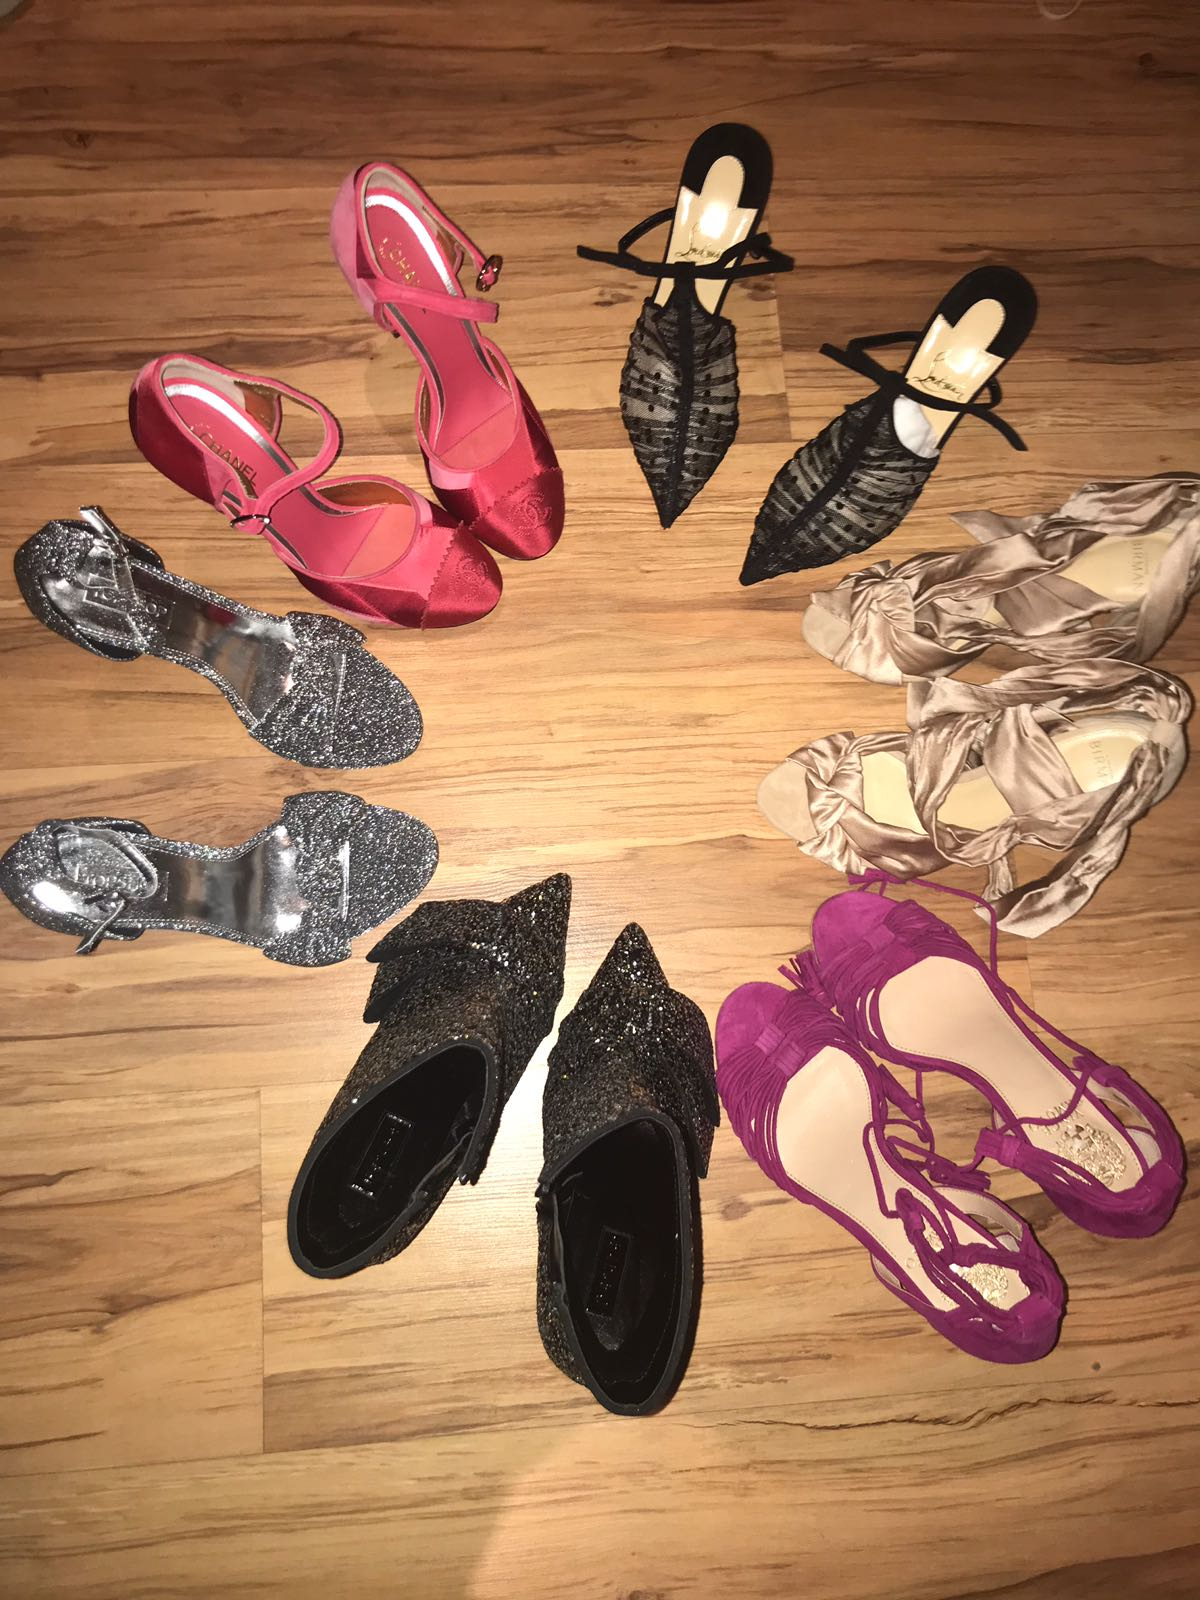 FOTO EXCLUSIV/ Are sute perechi, dar nu se poate opri. Cristina Dorobanțu și-a cumpărat din America... niște pantofi